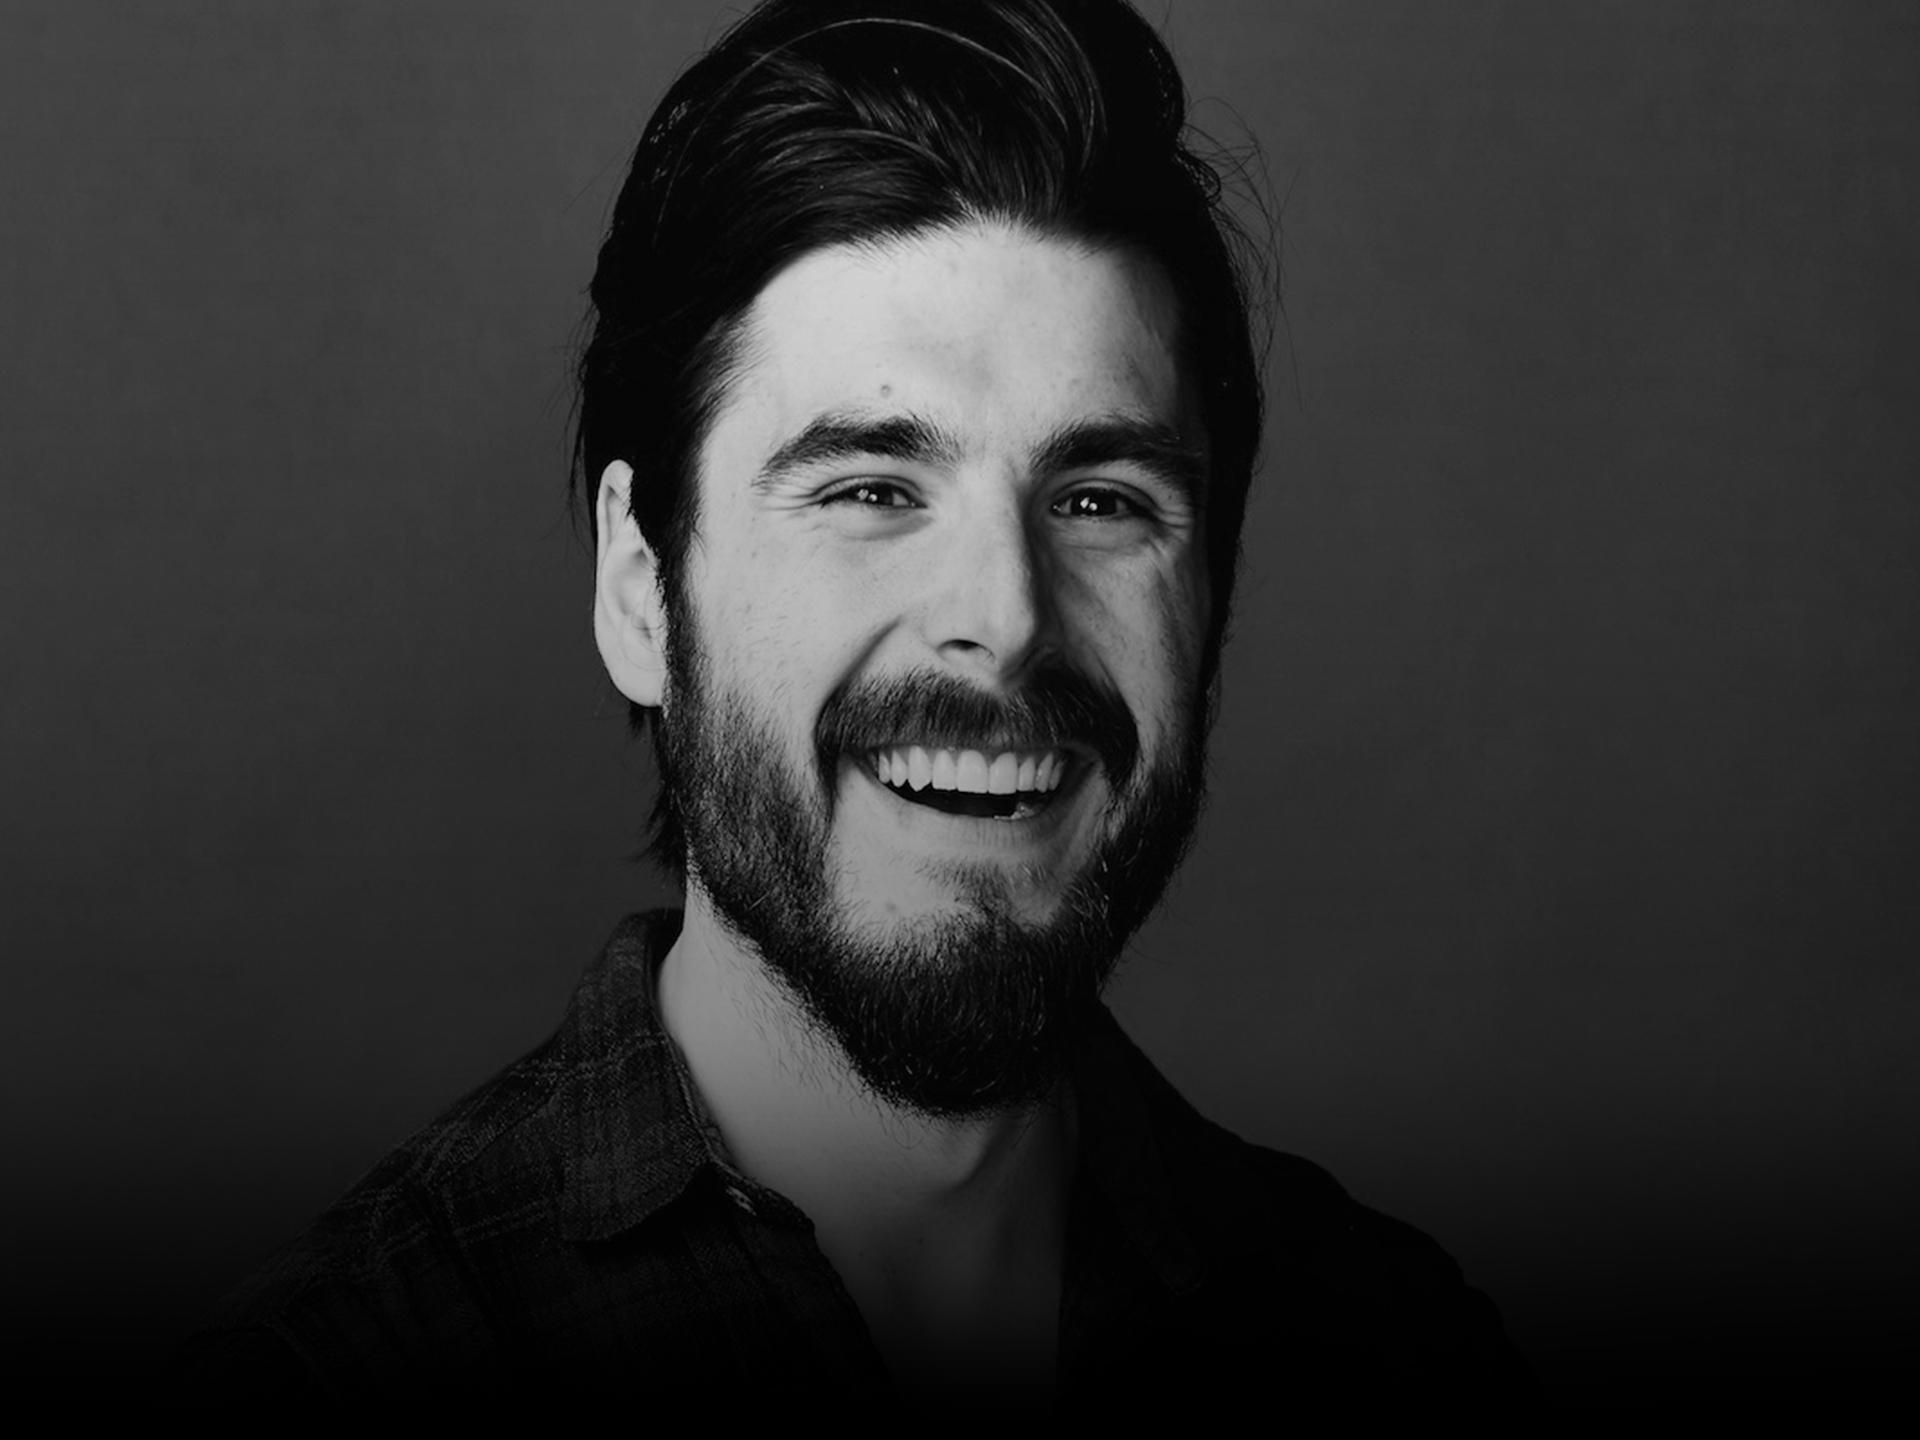 Image of Alec Stern